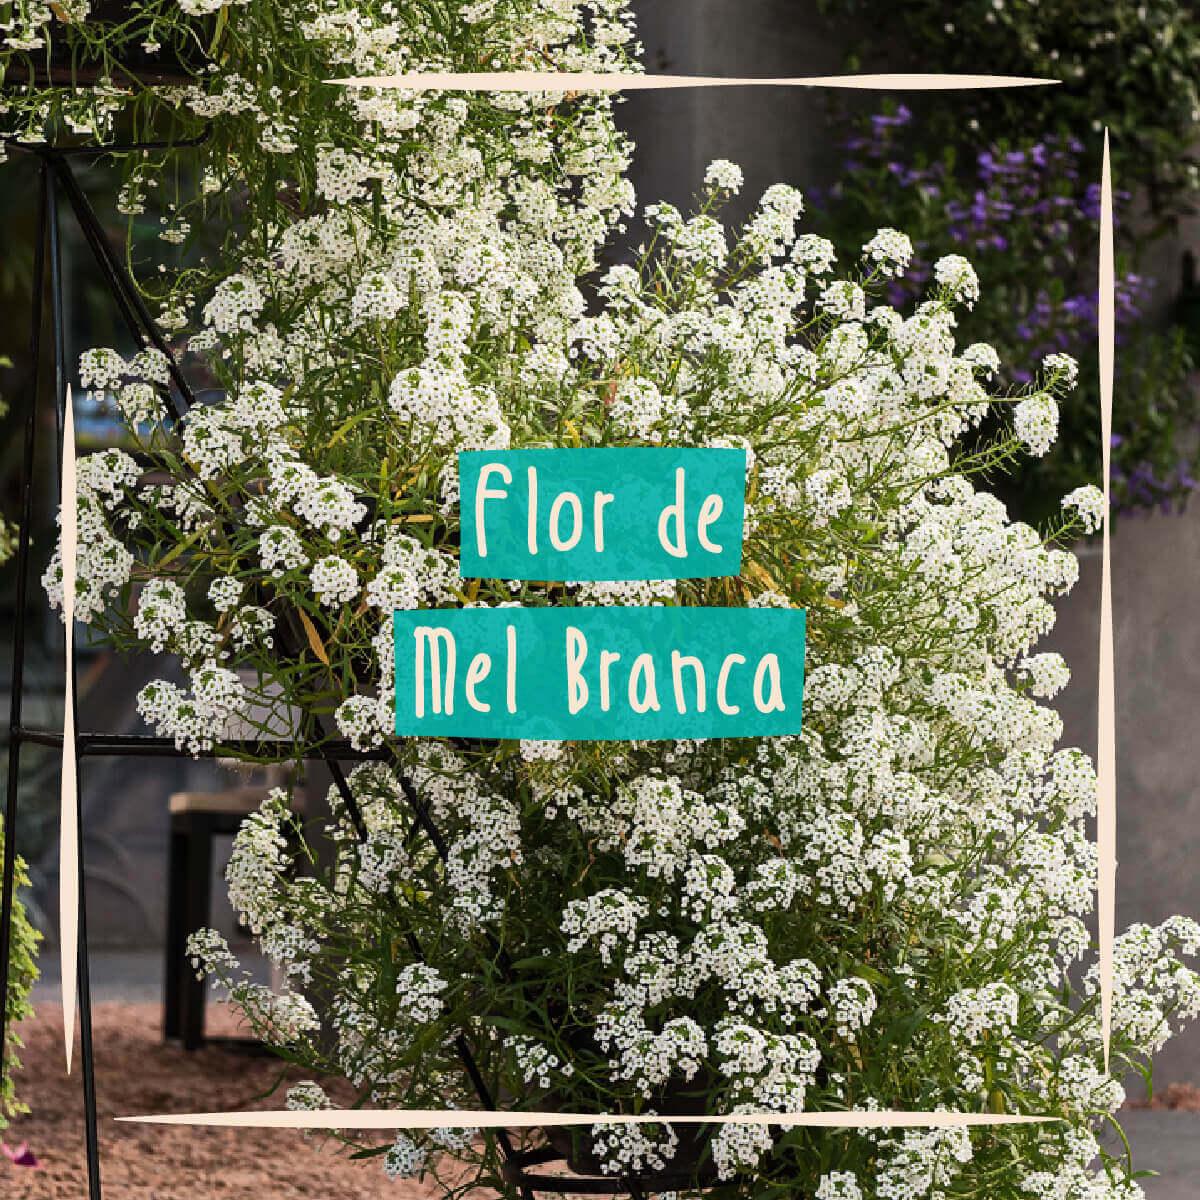 Sementes para plantar Alyssum Branco ou Flor de Mel em vasos autoirrigáveis RAIZ  - Vasos Raiz Loja Oficial